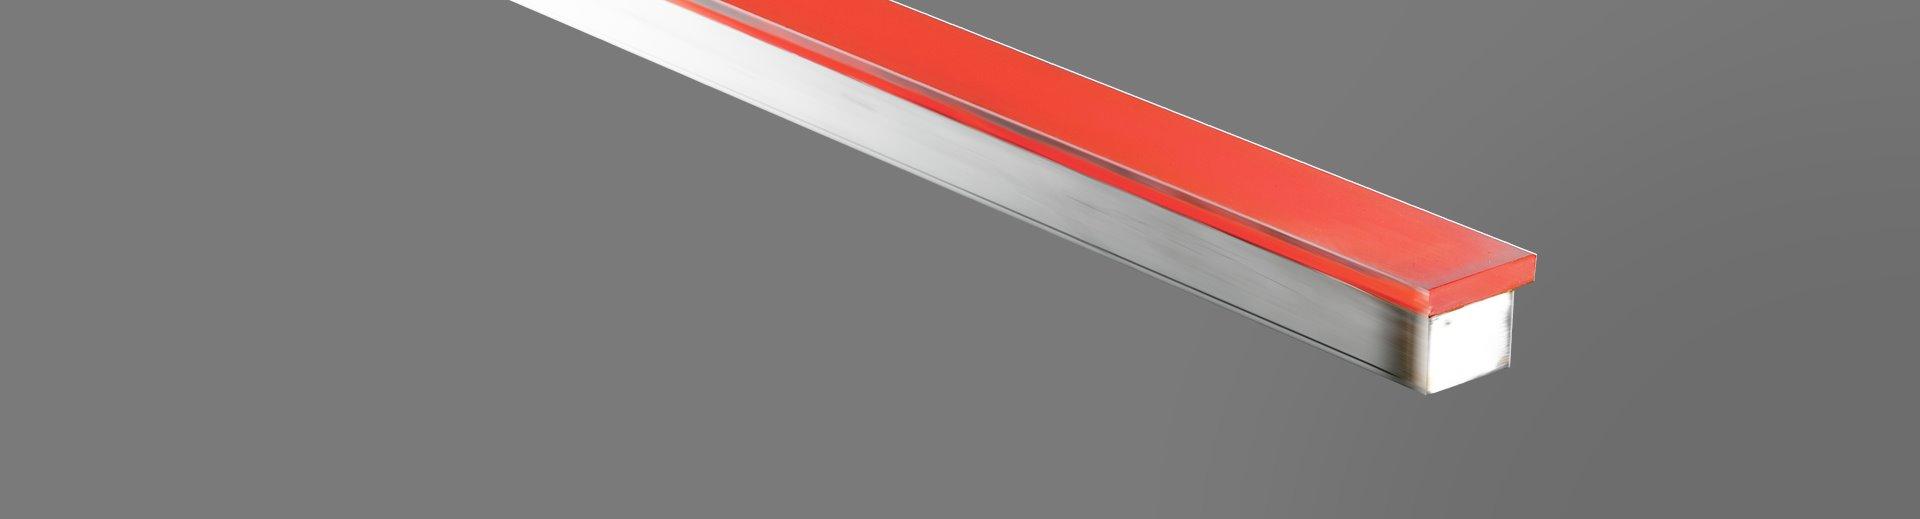 Targetti_Mini Mercure RGB_Banner